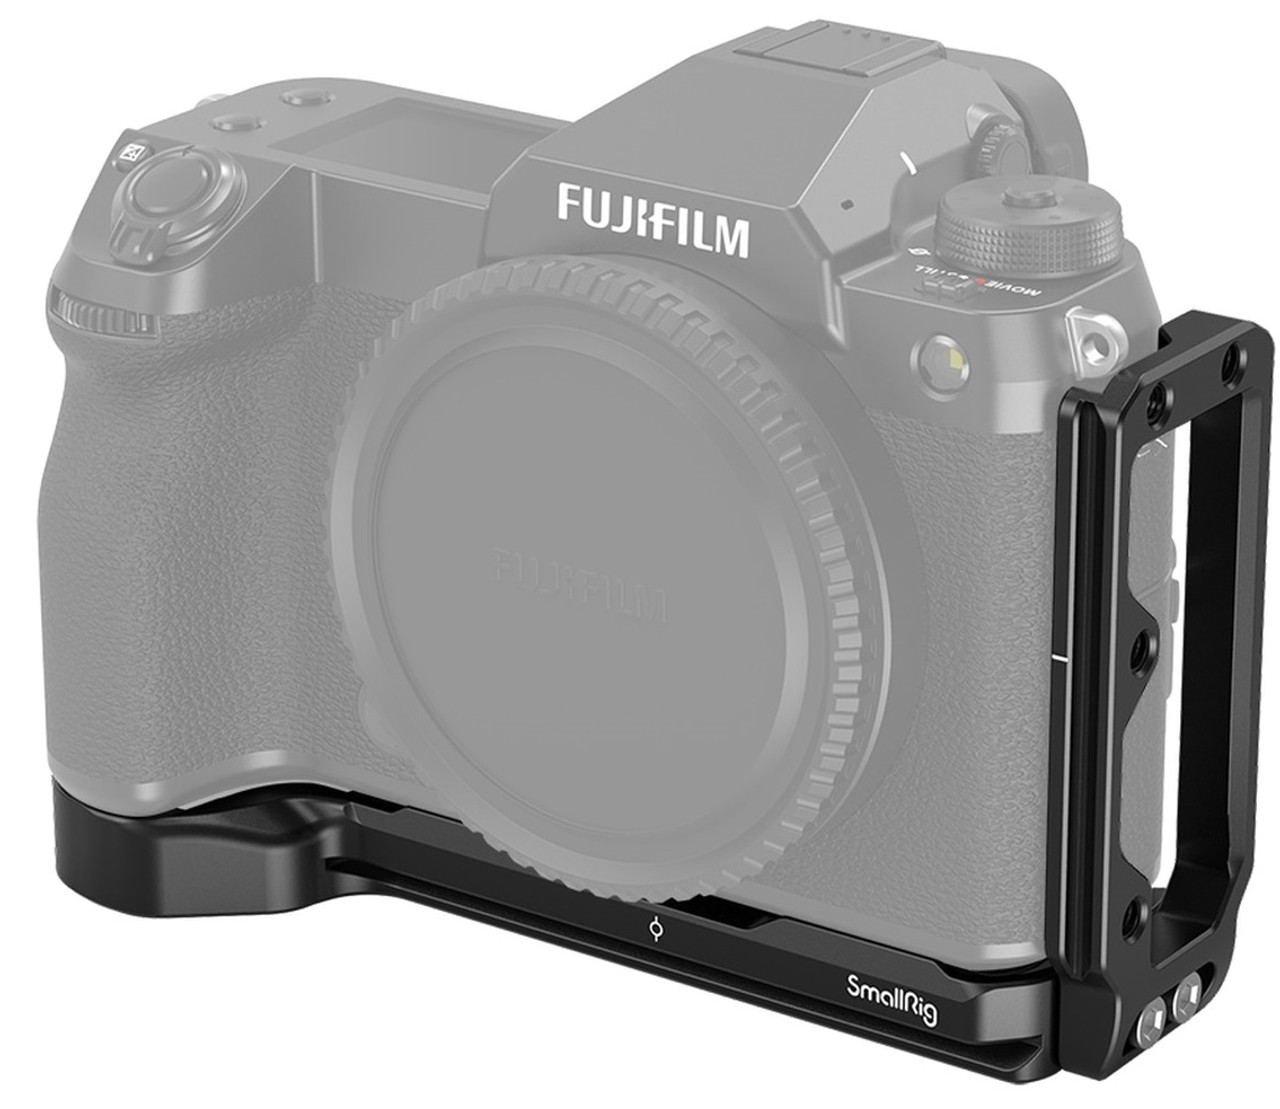 SmallRig L-Bracket for Fujifilm GFX 100S